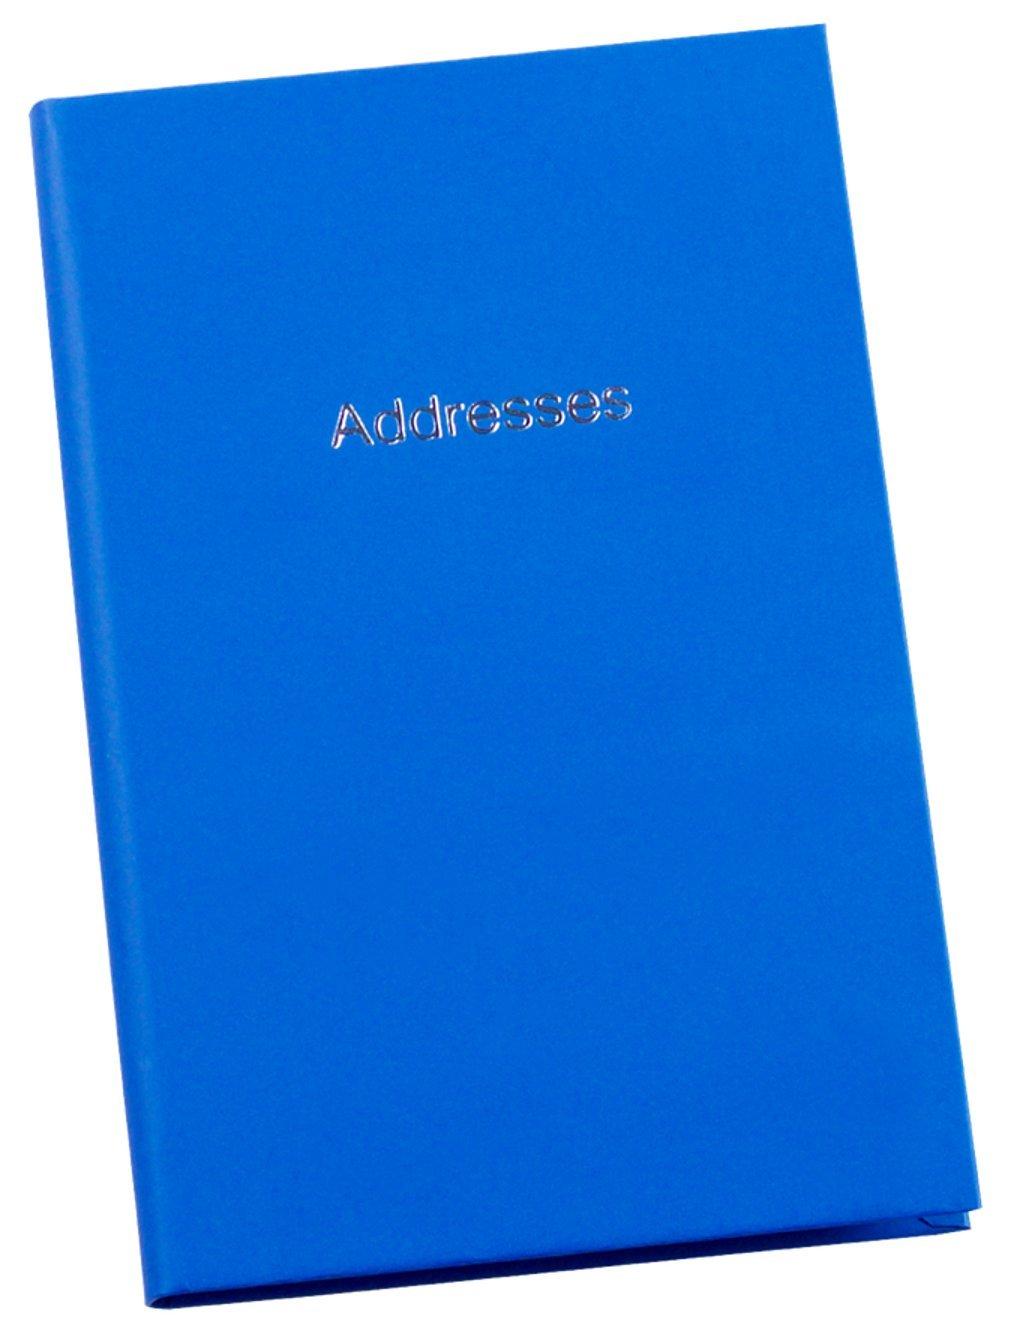 Small A7 Pocket Sized Hardback Personal Address Book Blue Esposti EL2-BLUE